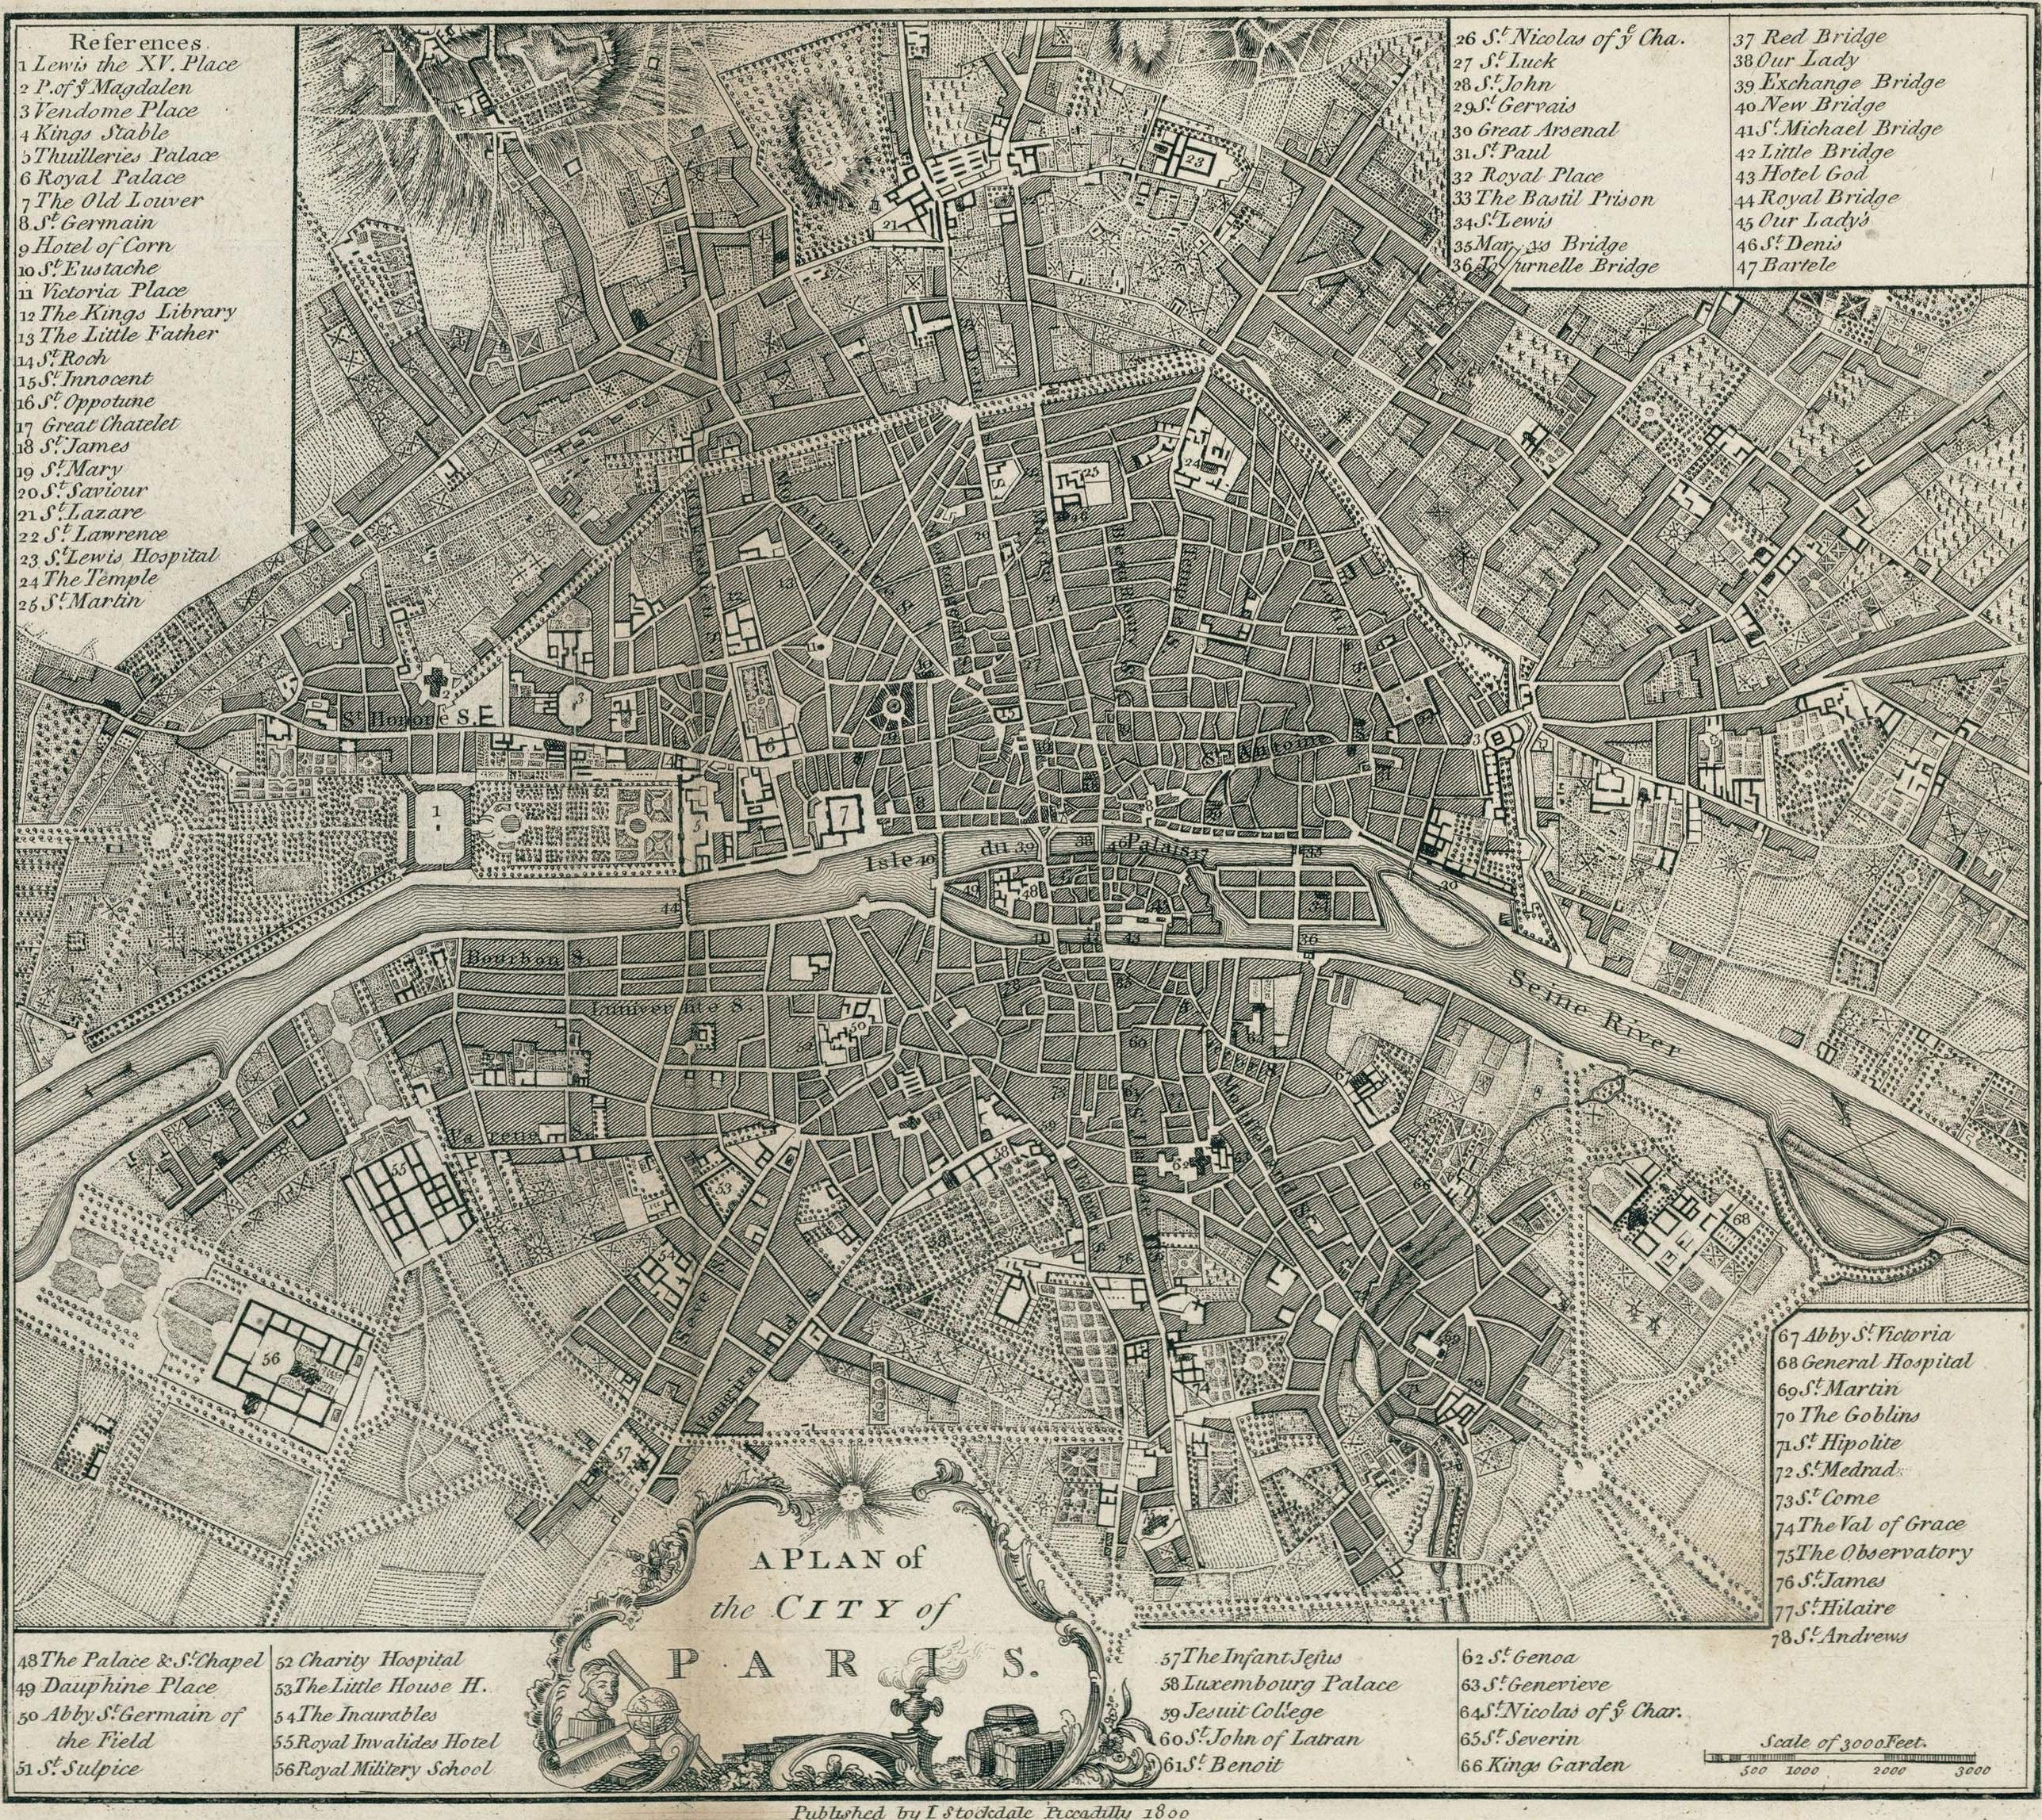 Louisiana Map Alexandria%0A    L u    histoire de Paris par ses plans